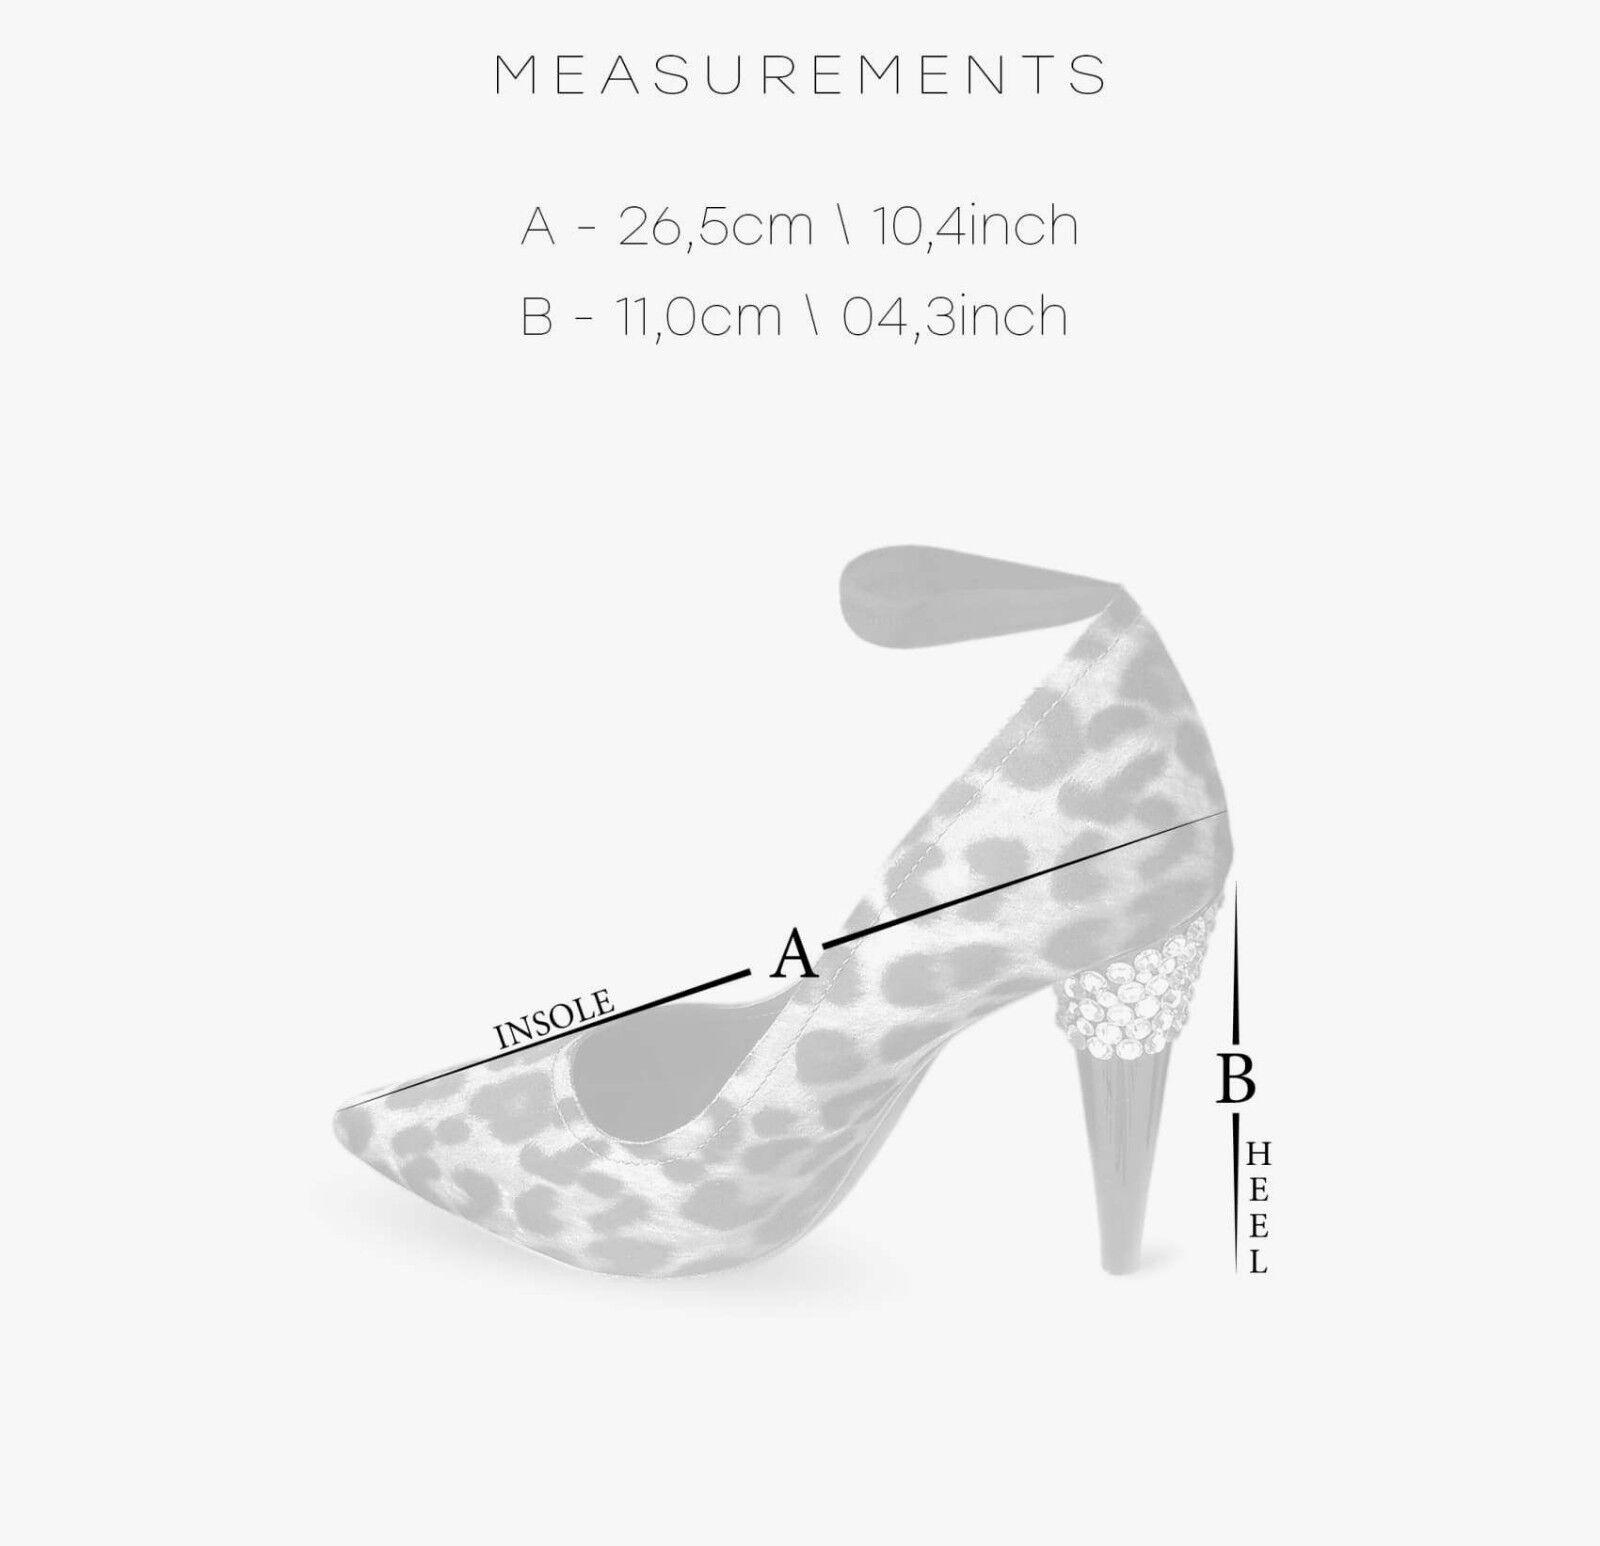 LANVIN for for LANVIN H&M Damens Leopard Pumps Größe 40 9 Leopard Heels Schuhes Stilettos 9 40 07be1b